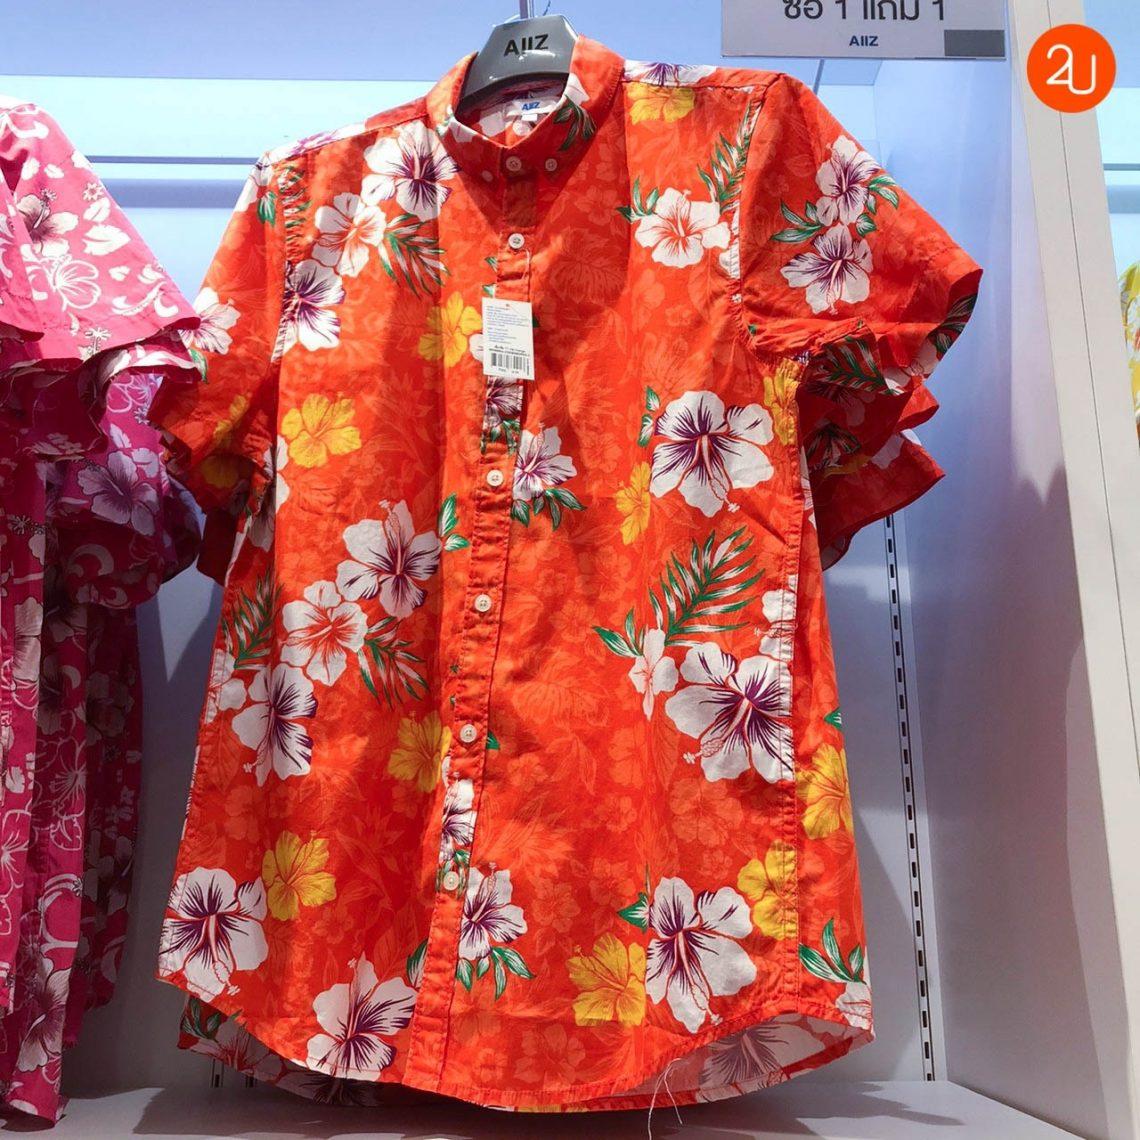 promotion AIIZ Floral shirt buy 1 get free 1